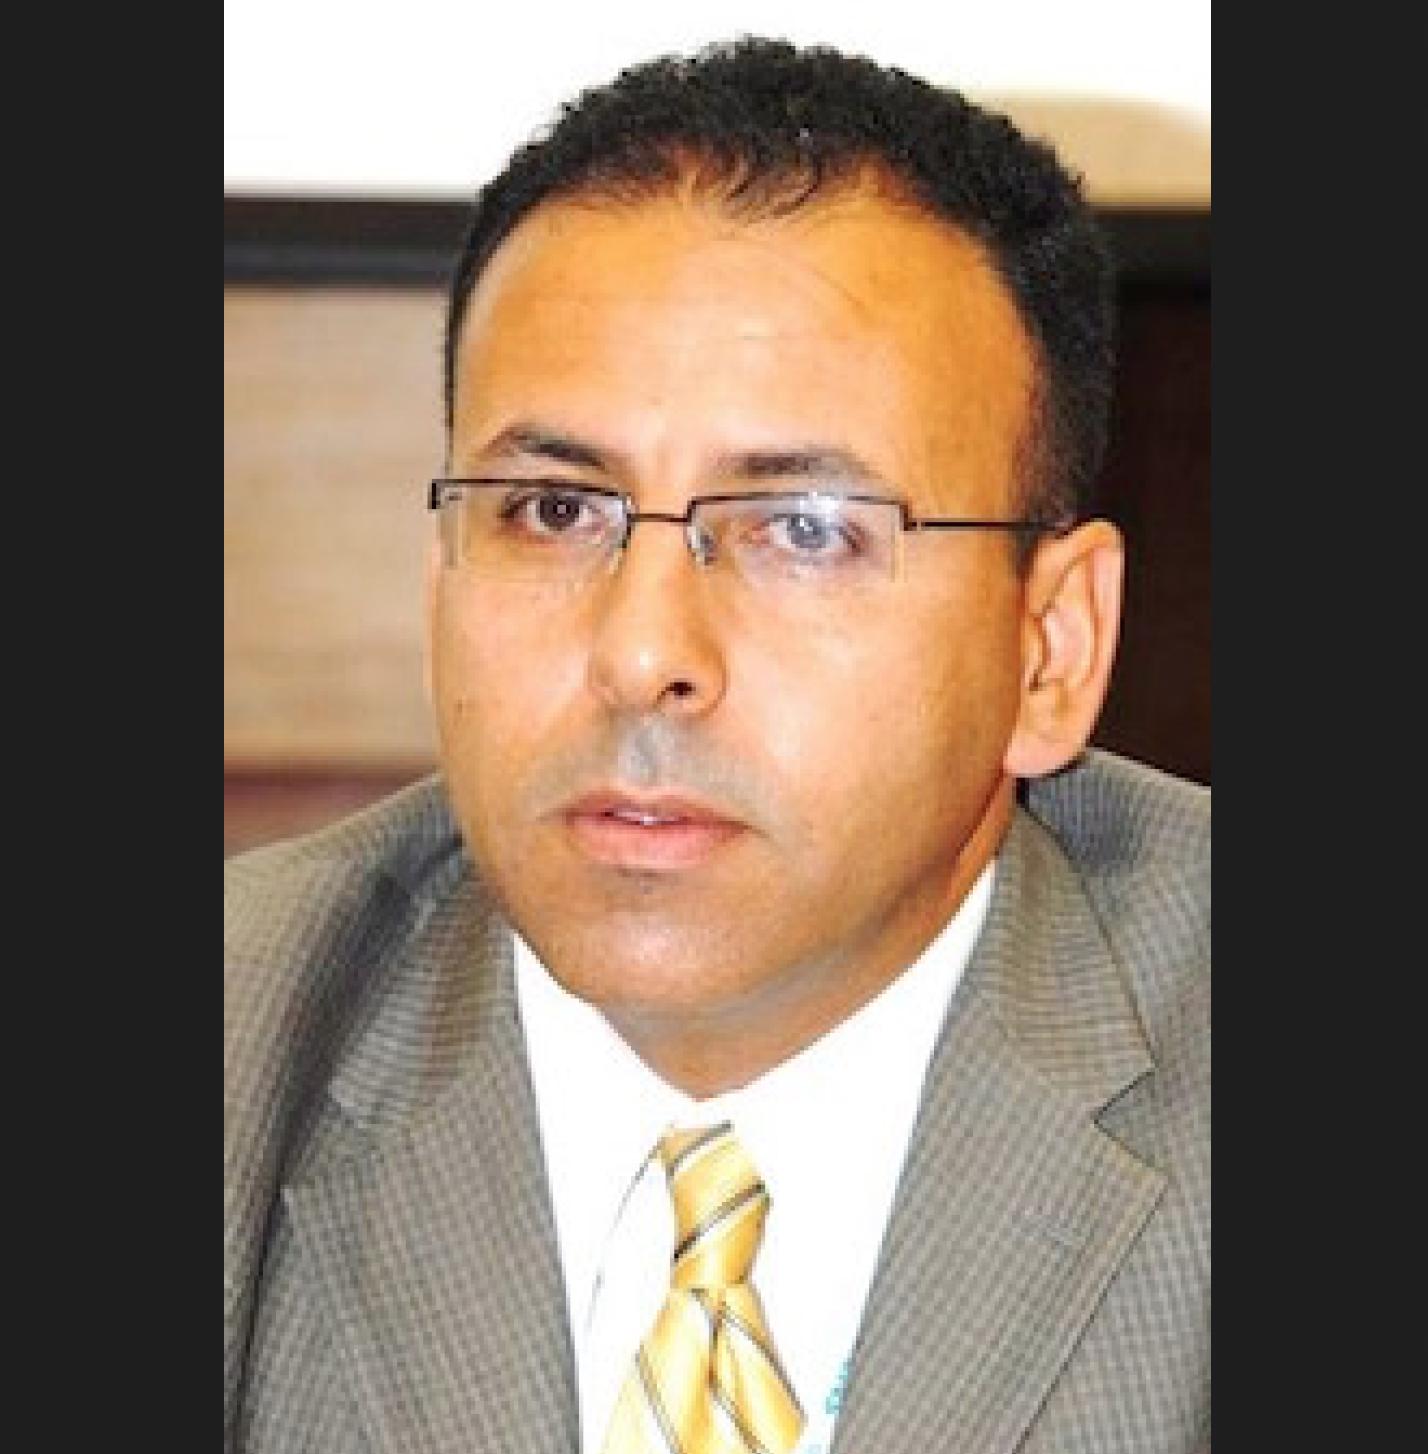 Abdelaziz Bouras